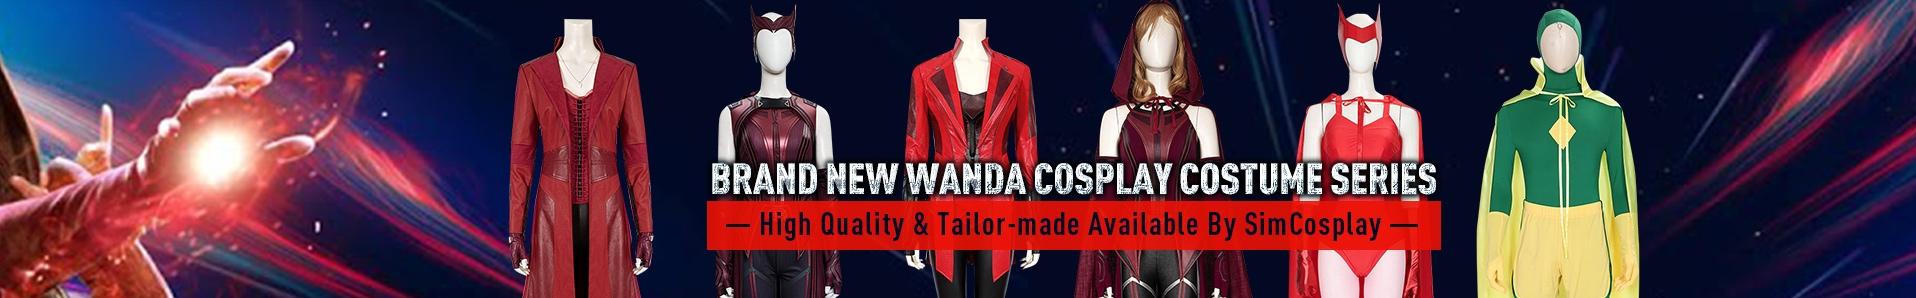 wanda cosplay costumes